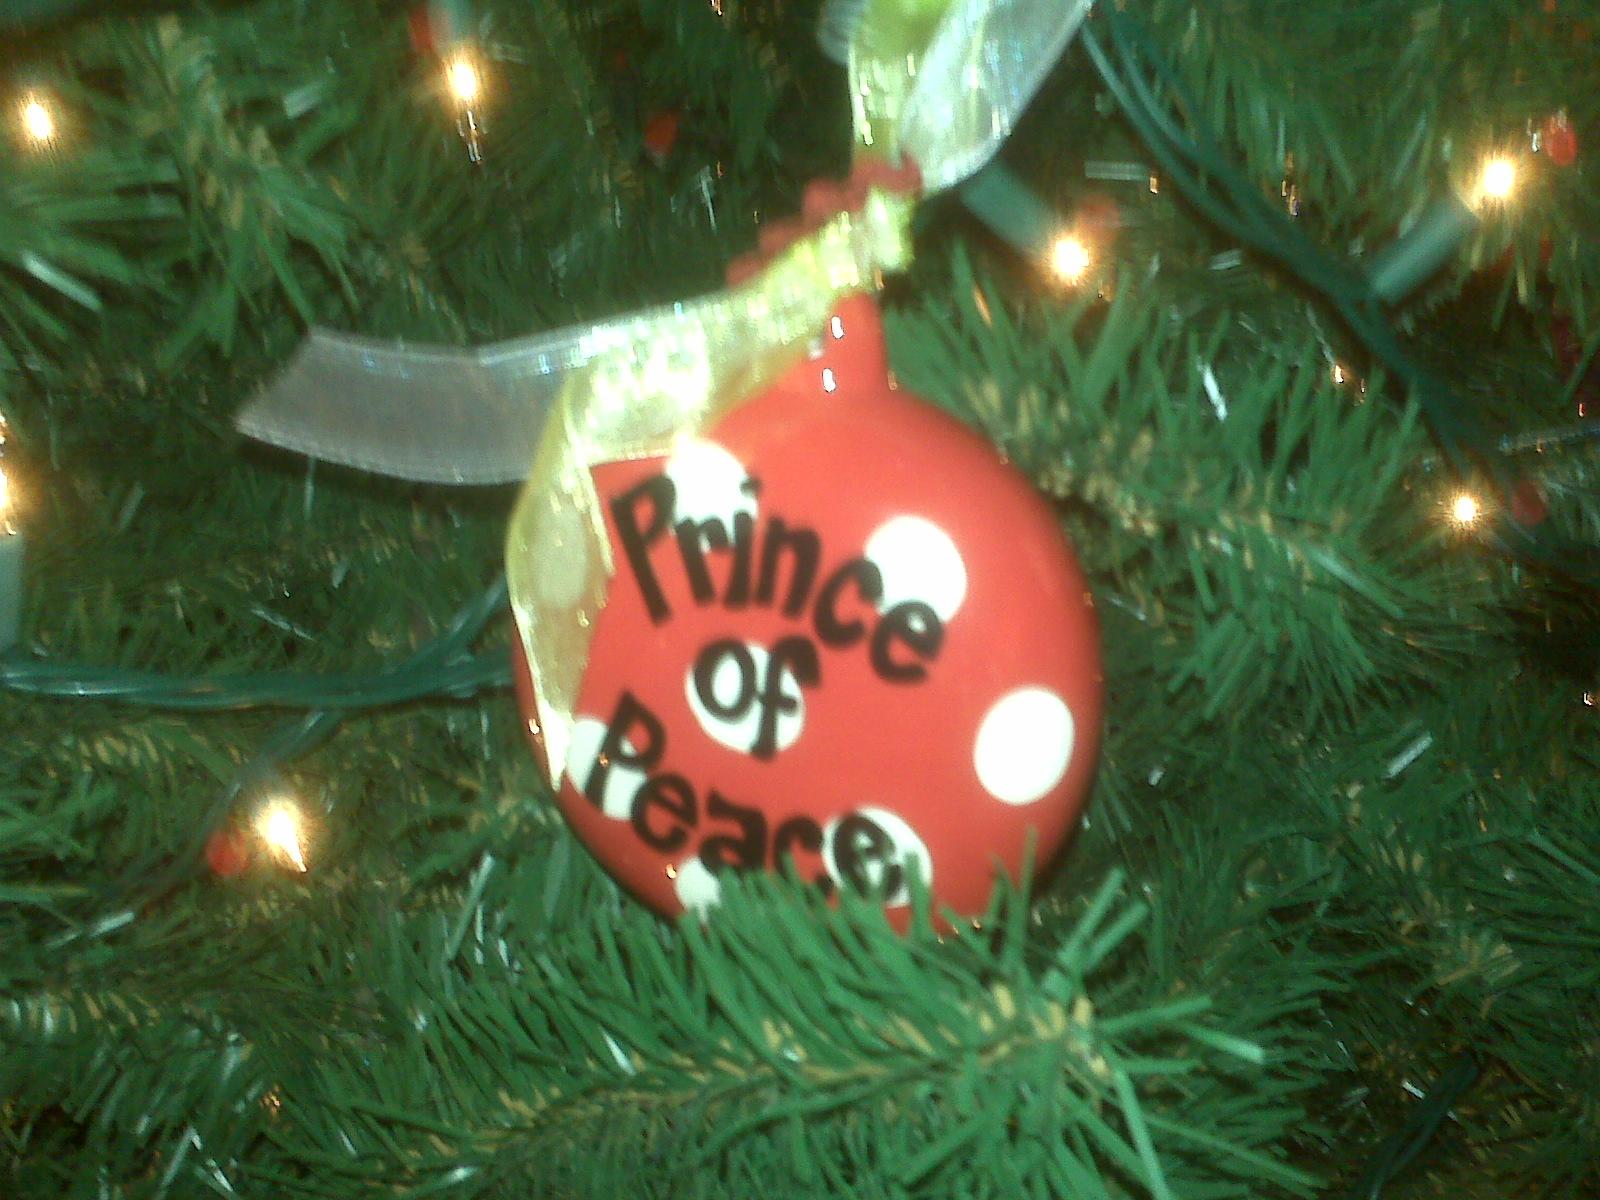 Decorating The Elevator: Christmas Par-tays (White Bean